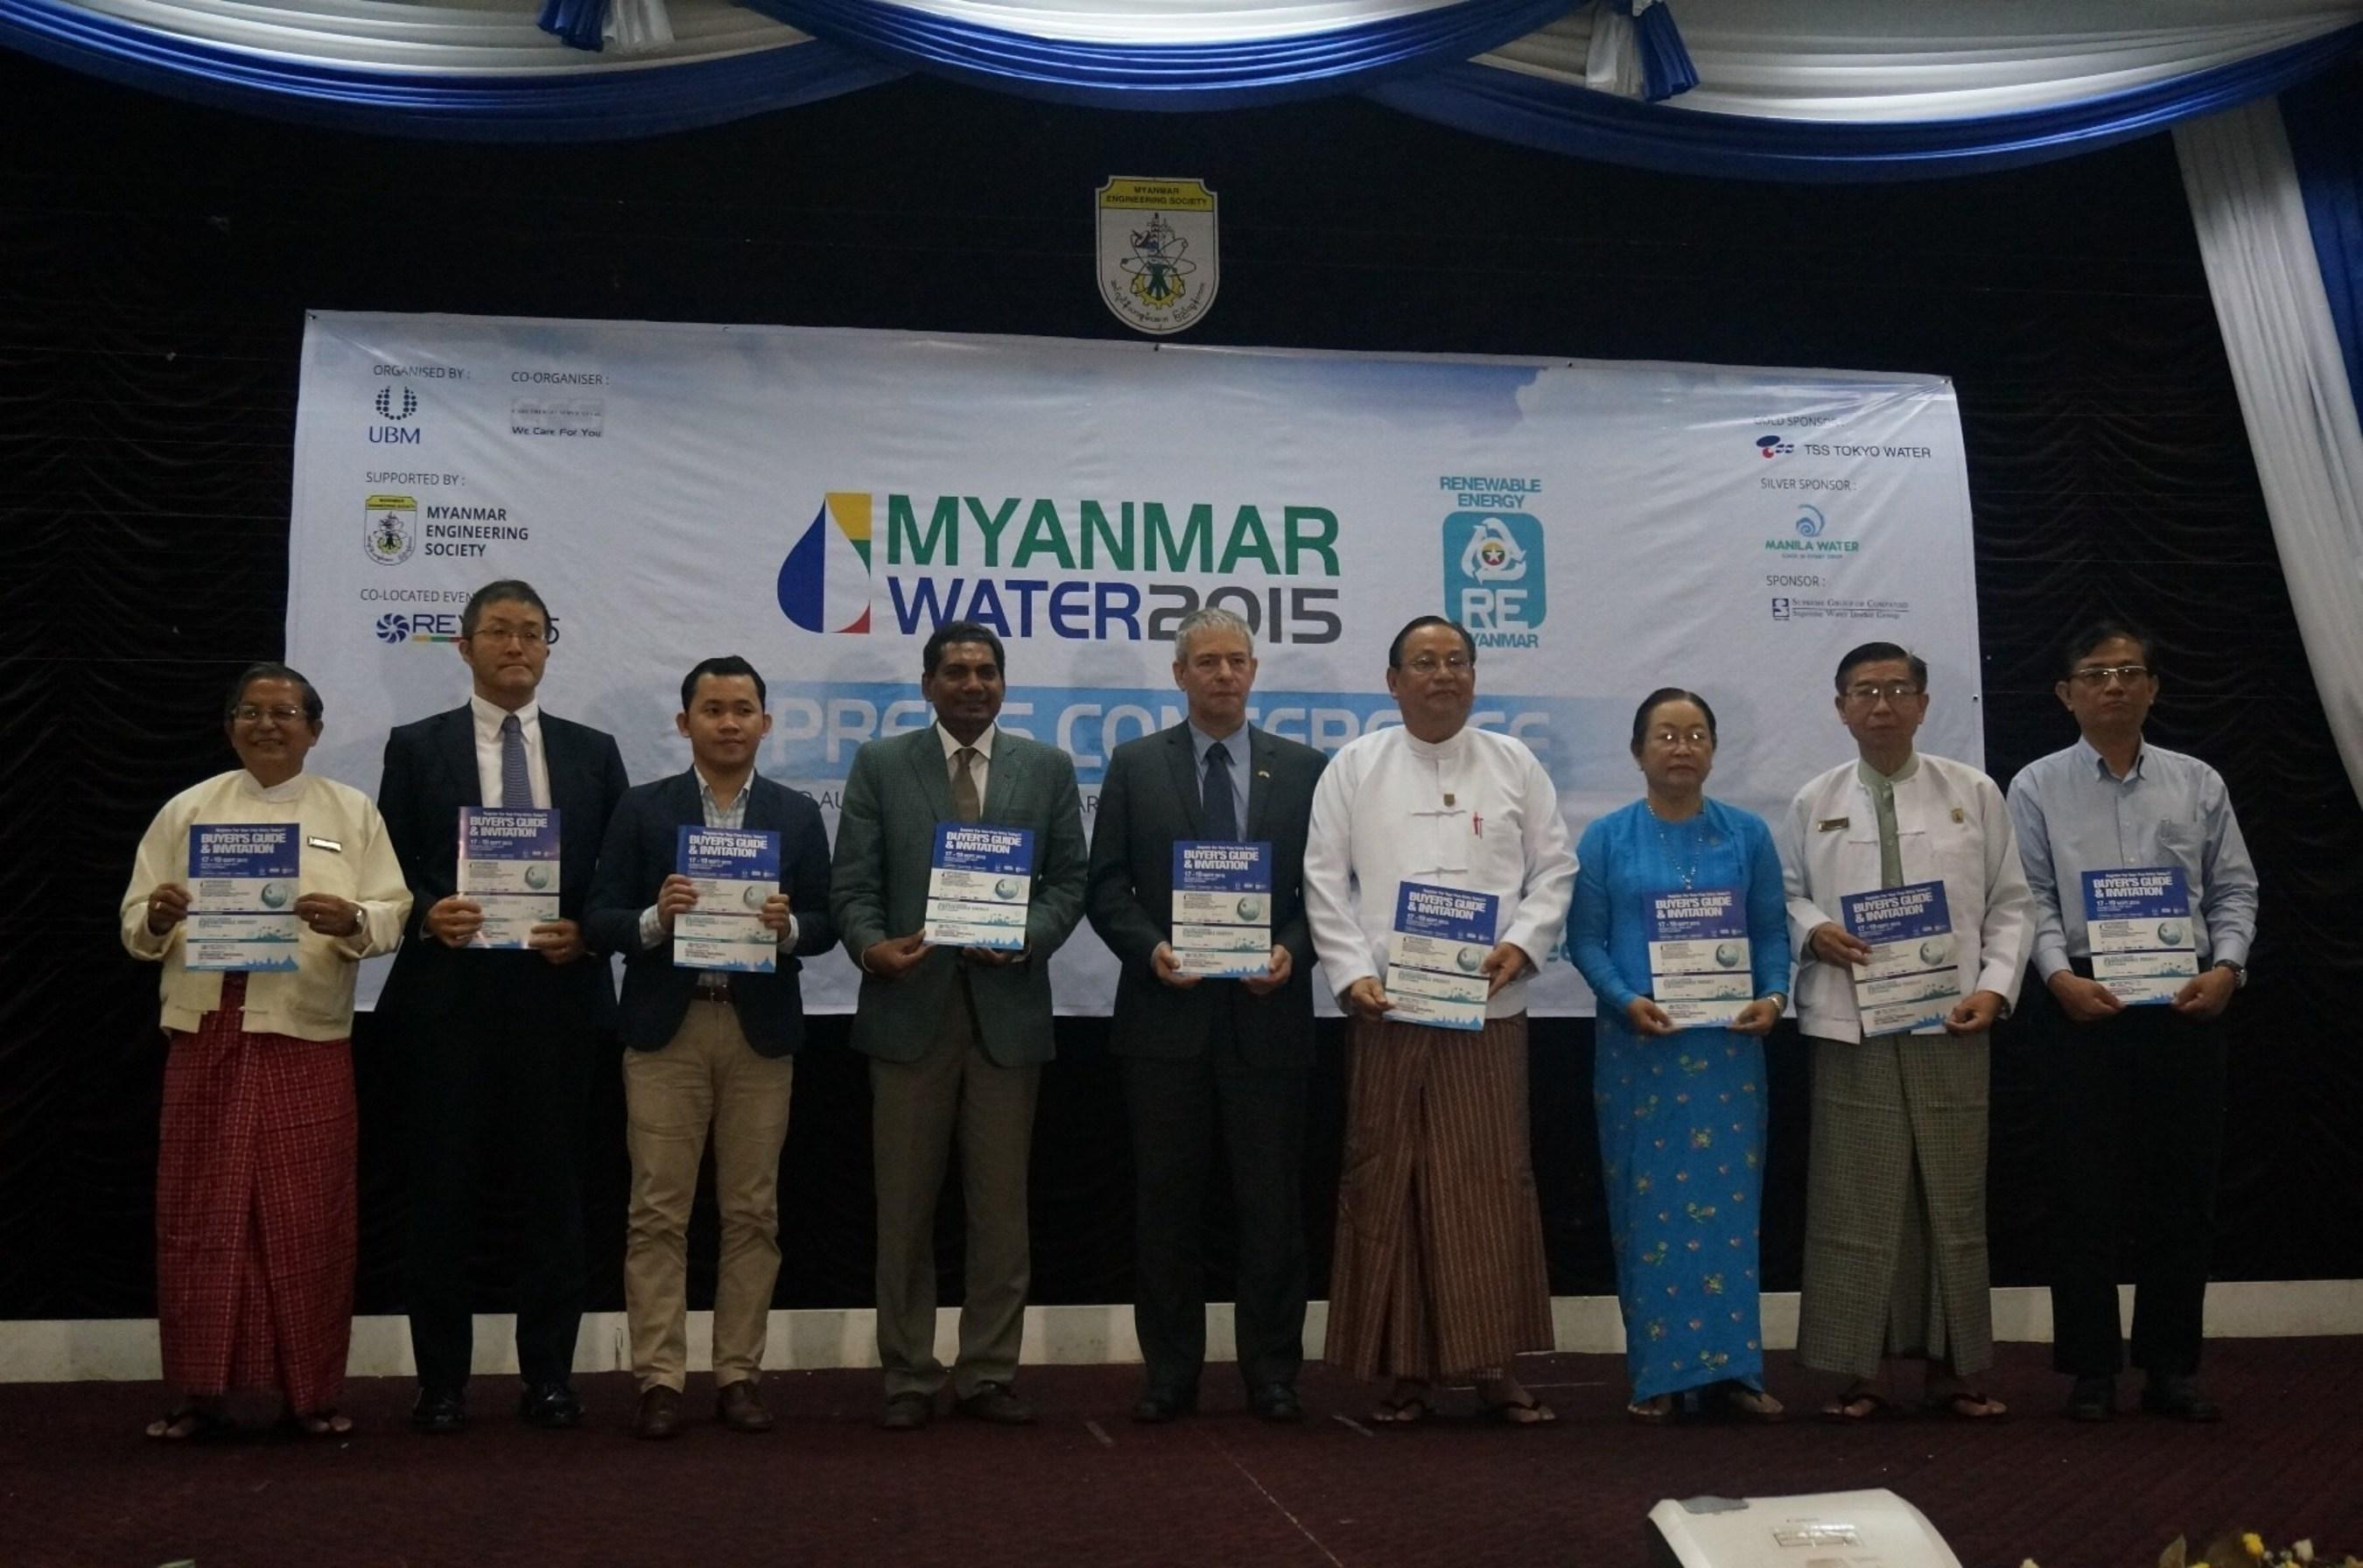 (from left) U. Khin Maung Htaey, MES; Dr. Katsuyuki Kadota, Oji Holdings Corporation; Mr. Michael Rico, Manila ...